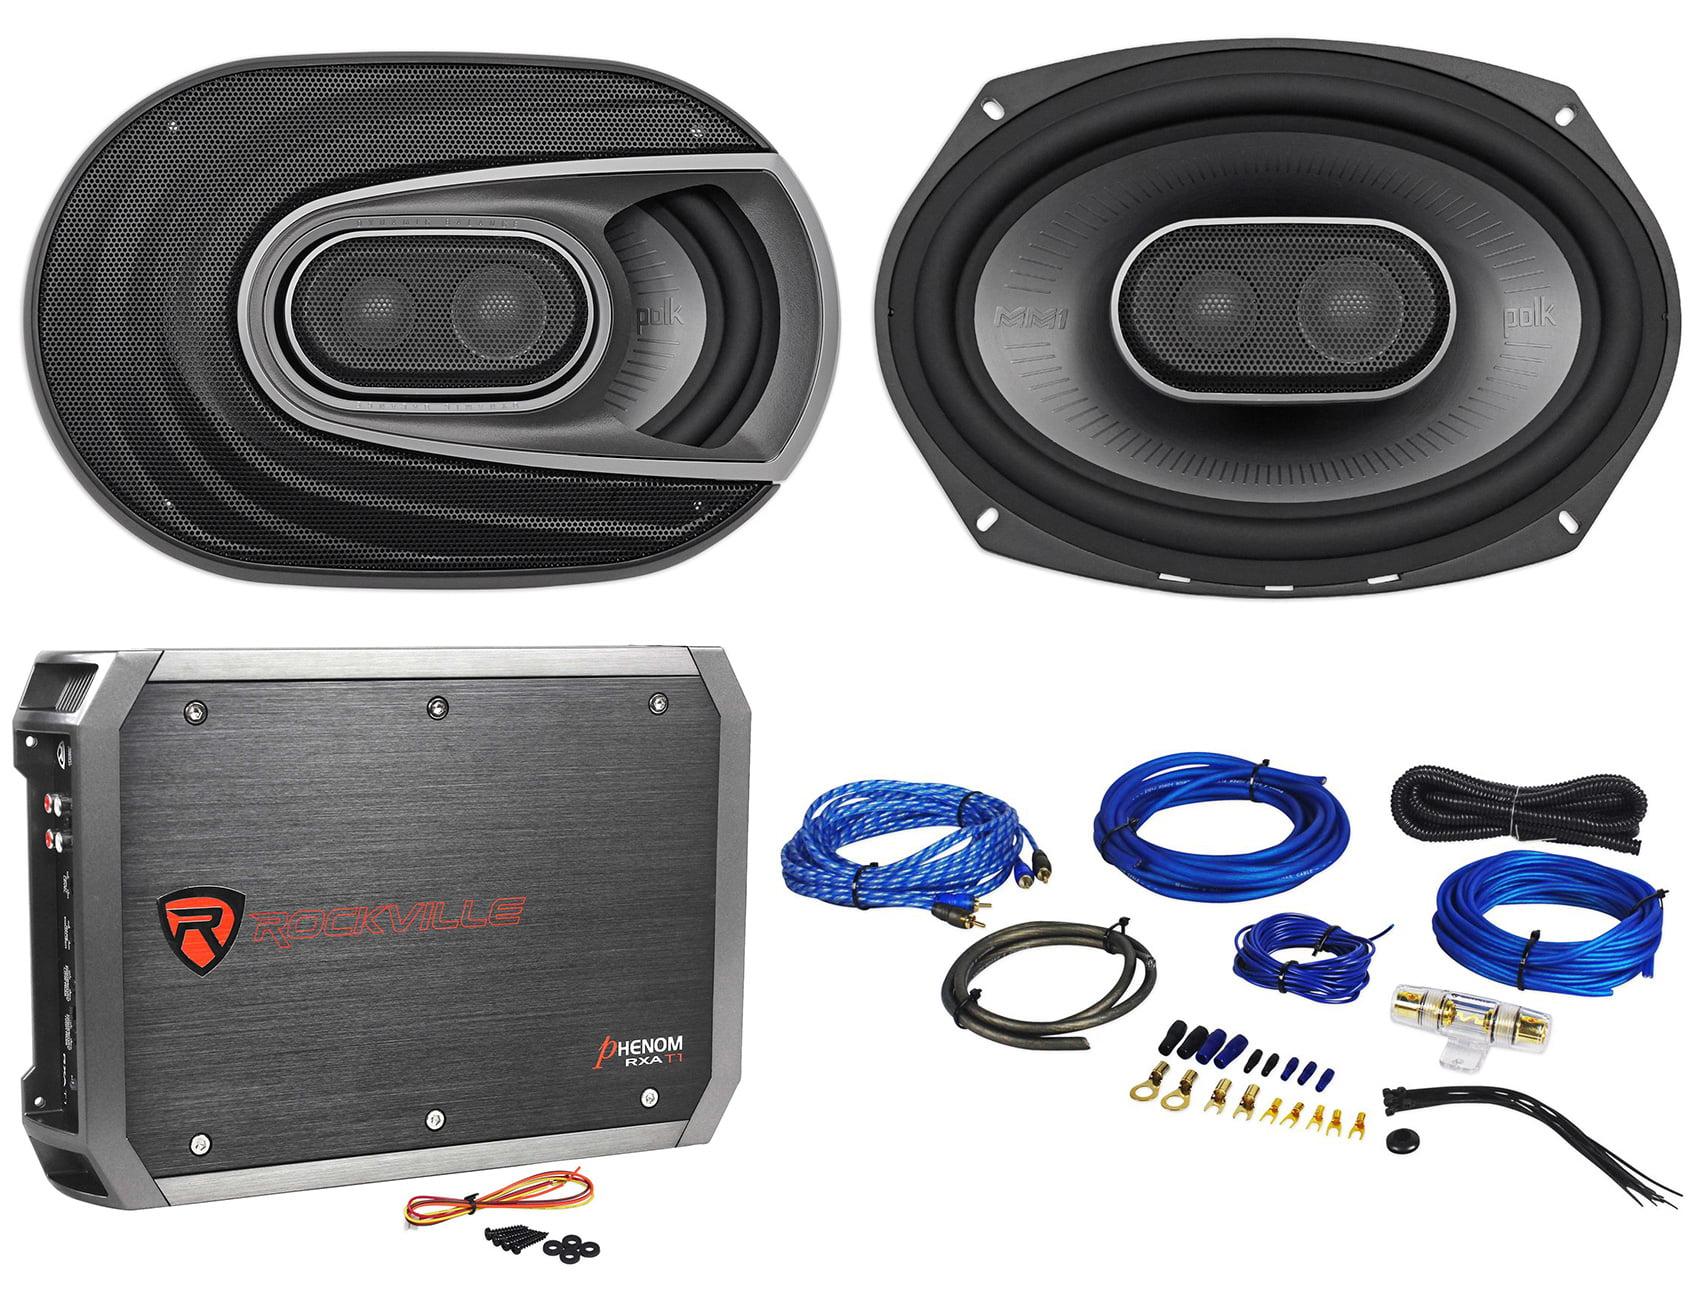 hight resolution of polk audio car subwoofer wiring kits wiring diagrams home audio subwoofer wiring 2 polk audio